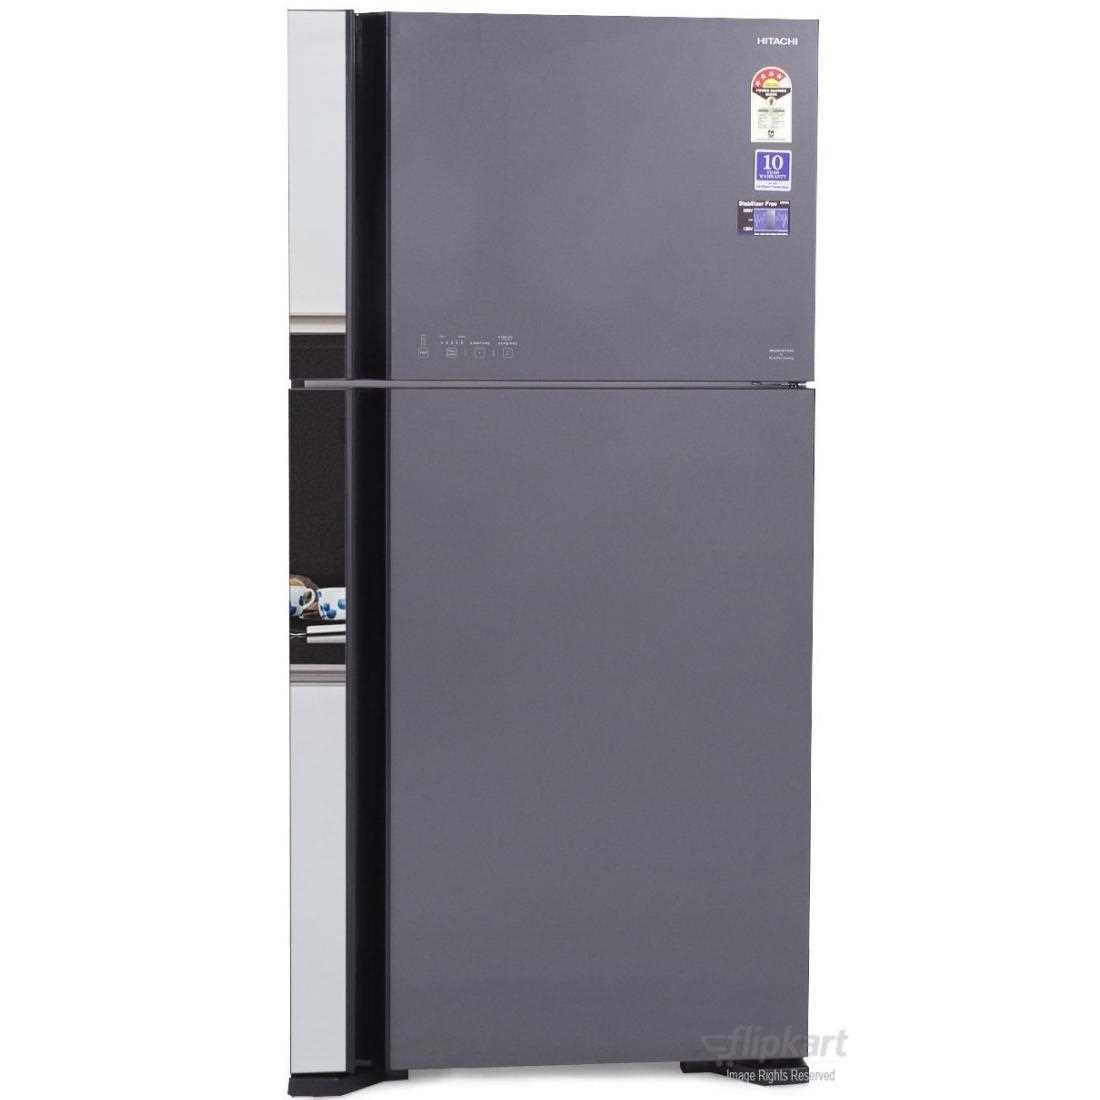 Hitachi R VG610PND3 Double Door 586 Litres Frost Free